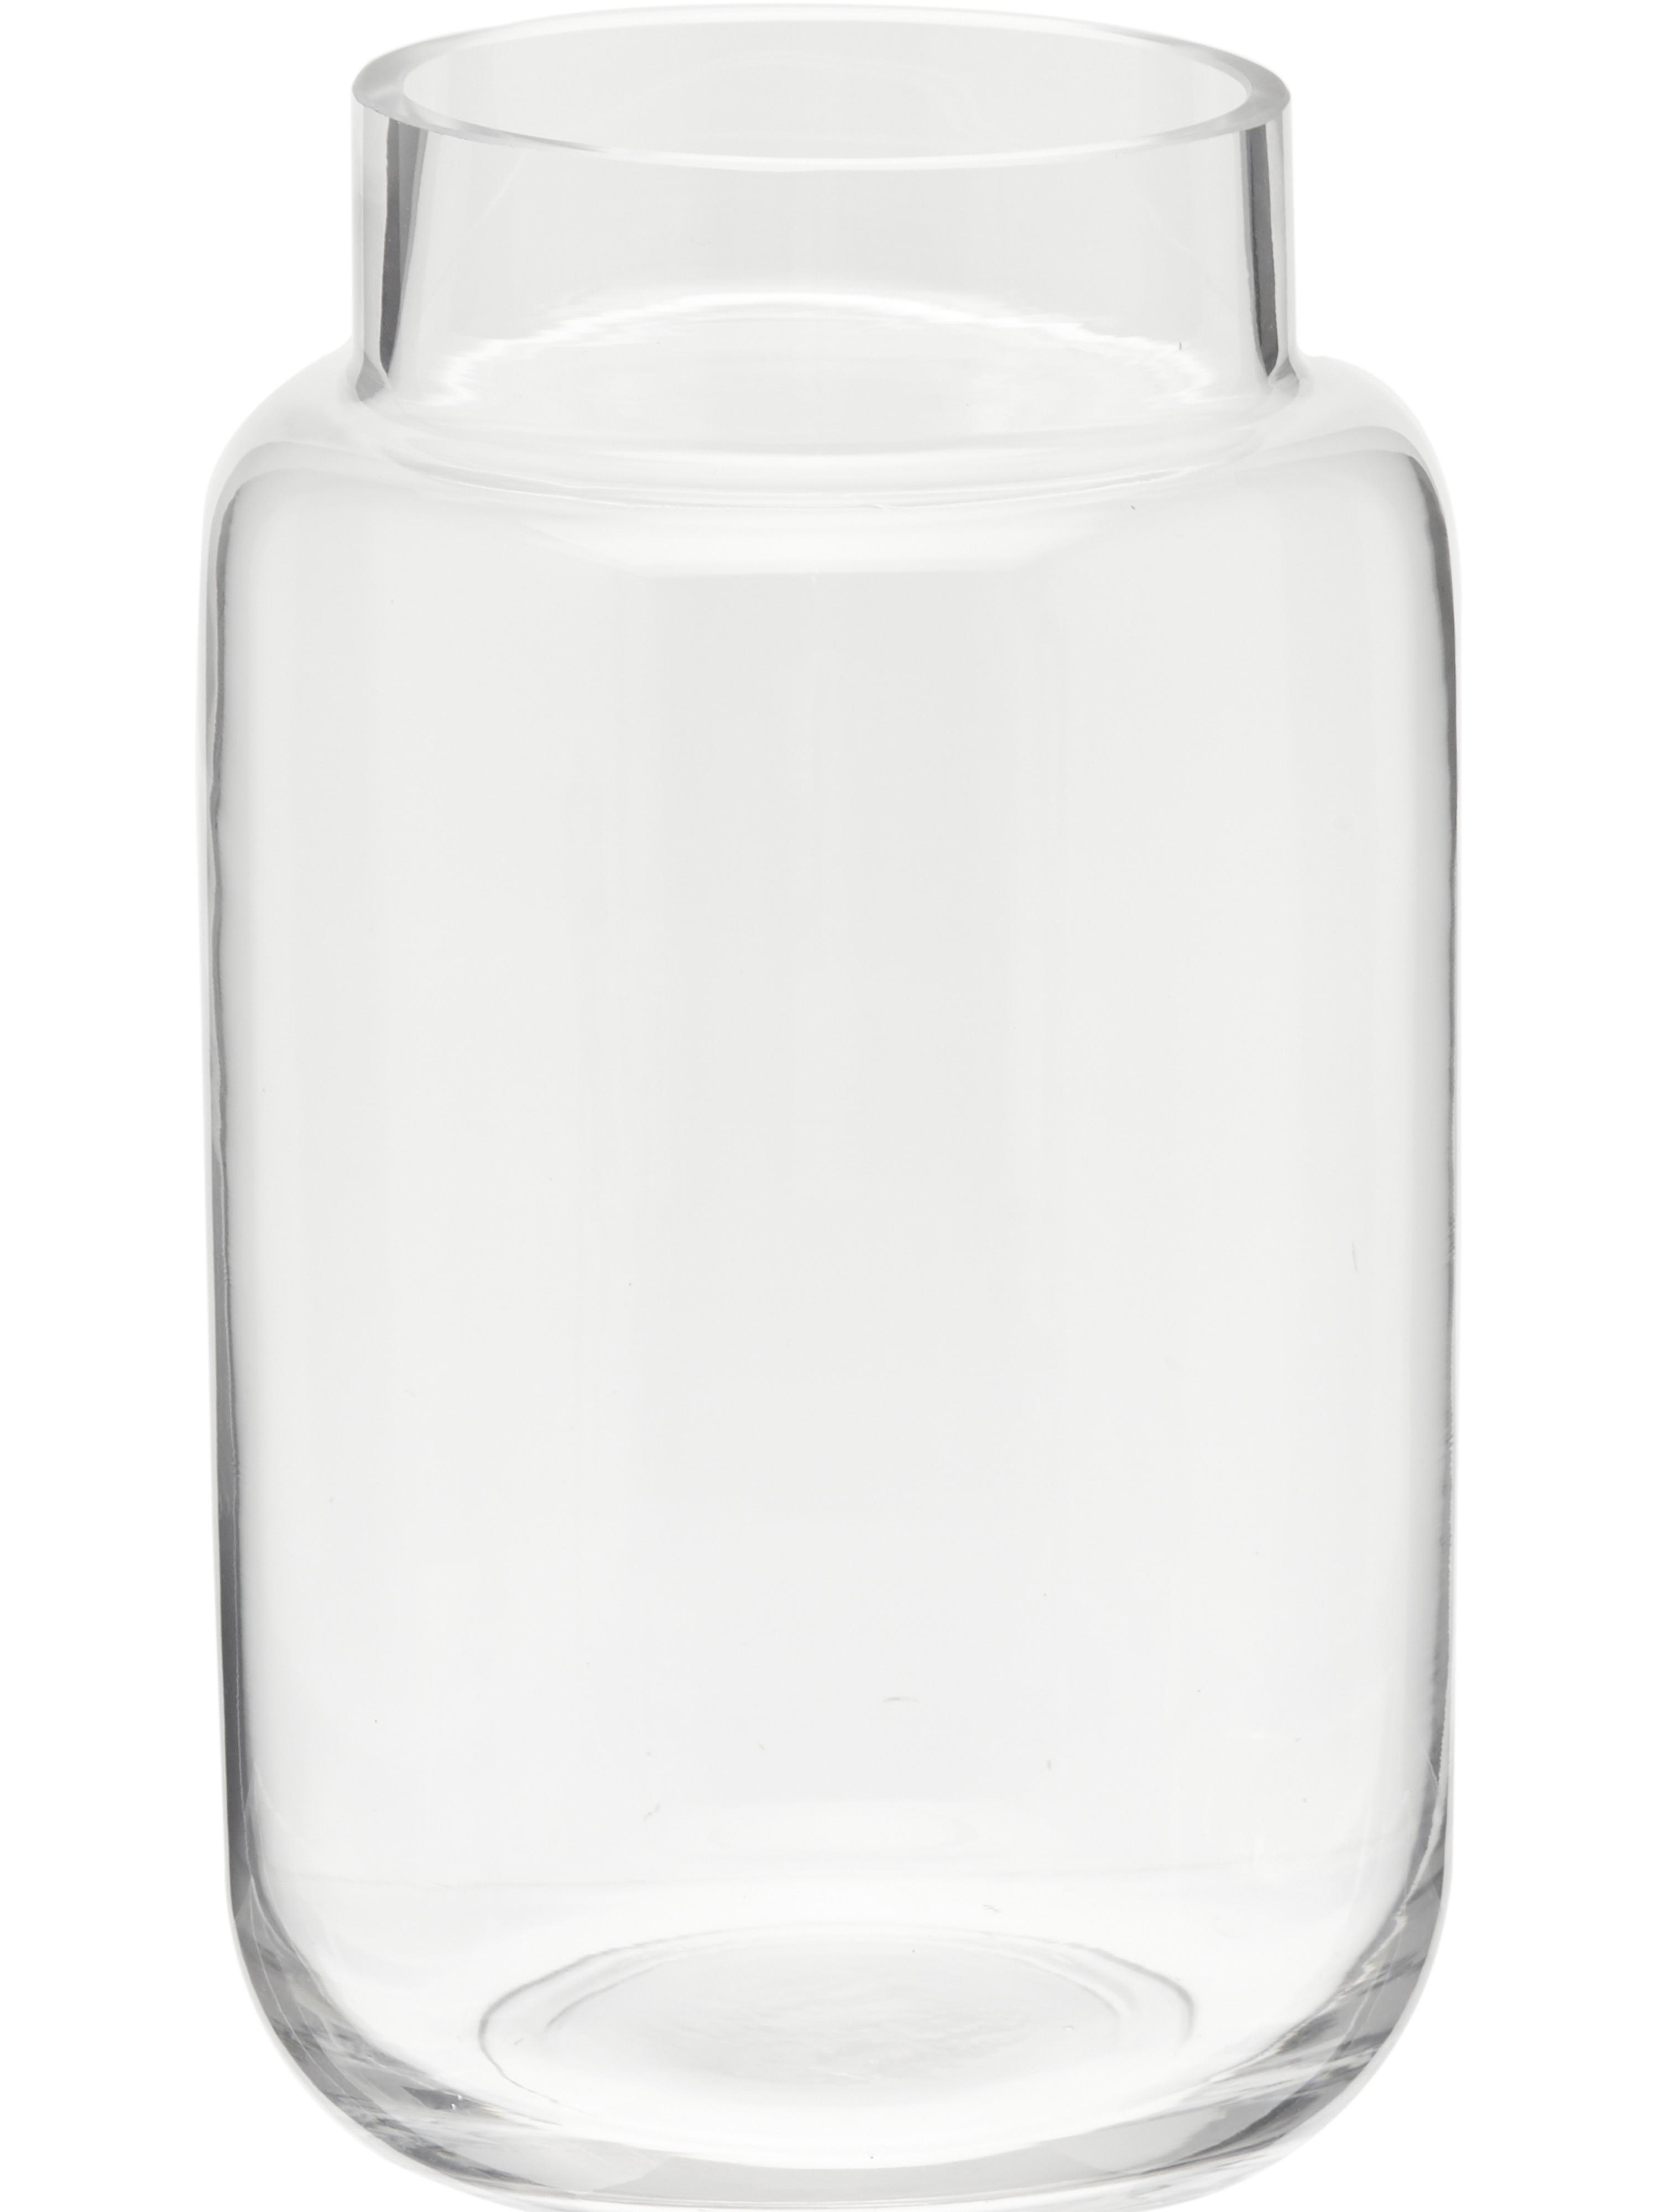 Glazen vaas Lasse, groot, Glas, Transparant, Ø 14 x H 23 cm